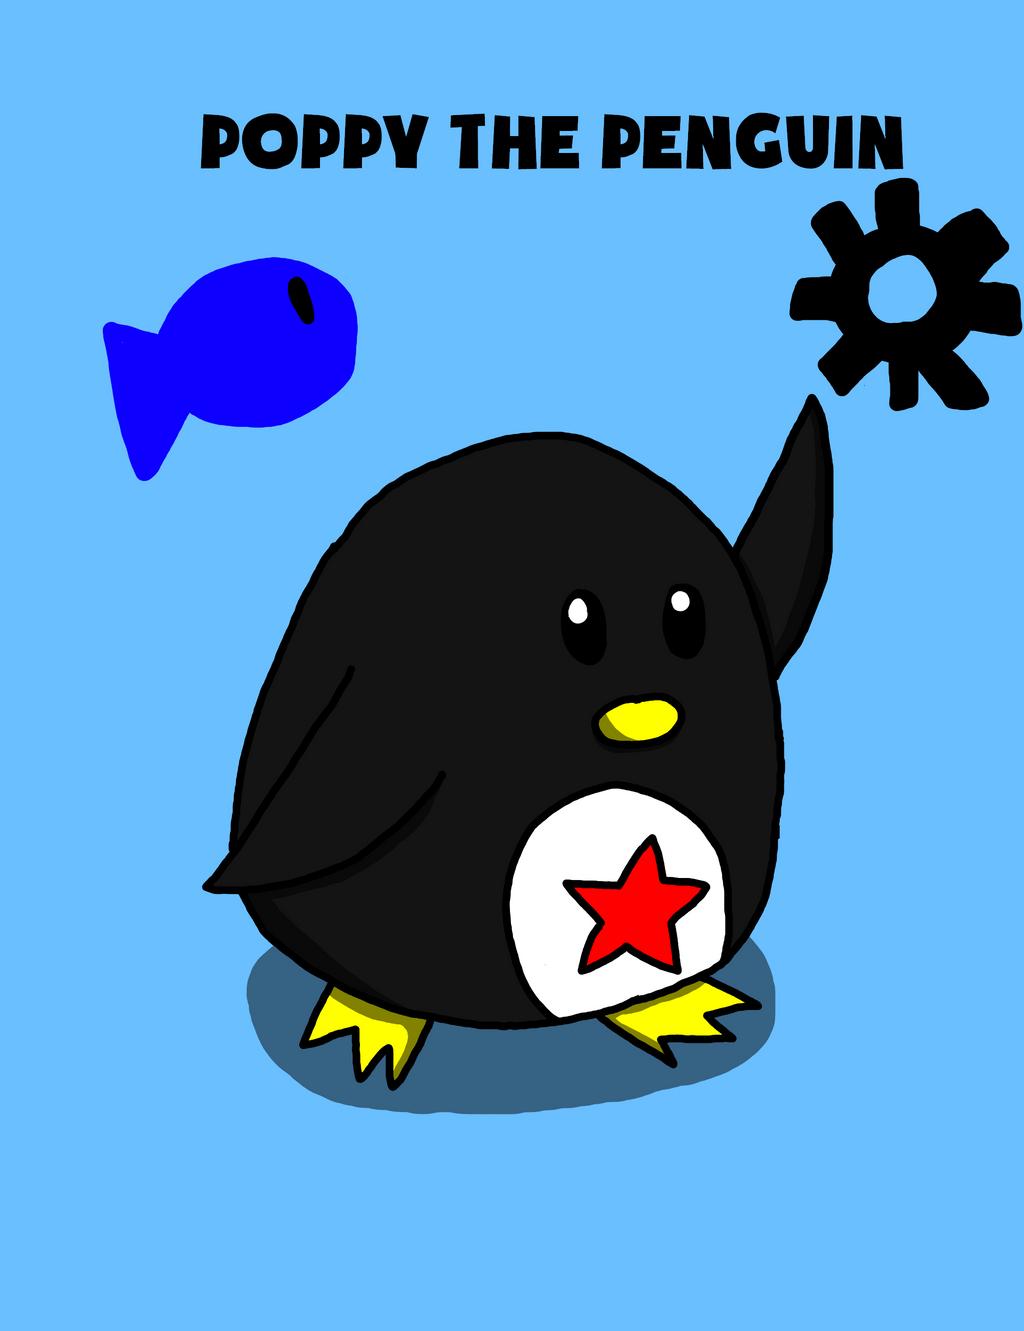 Poppy the Penguin by RichardtheDarkBoy29